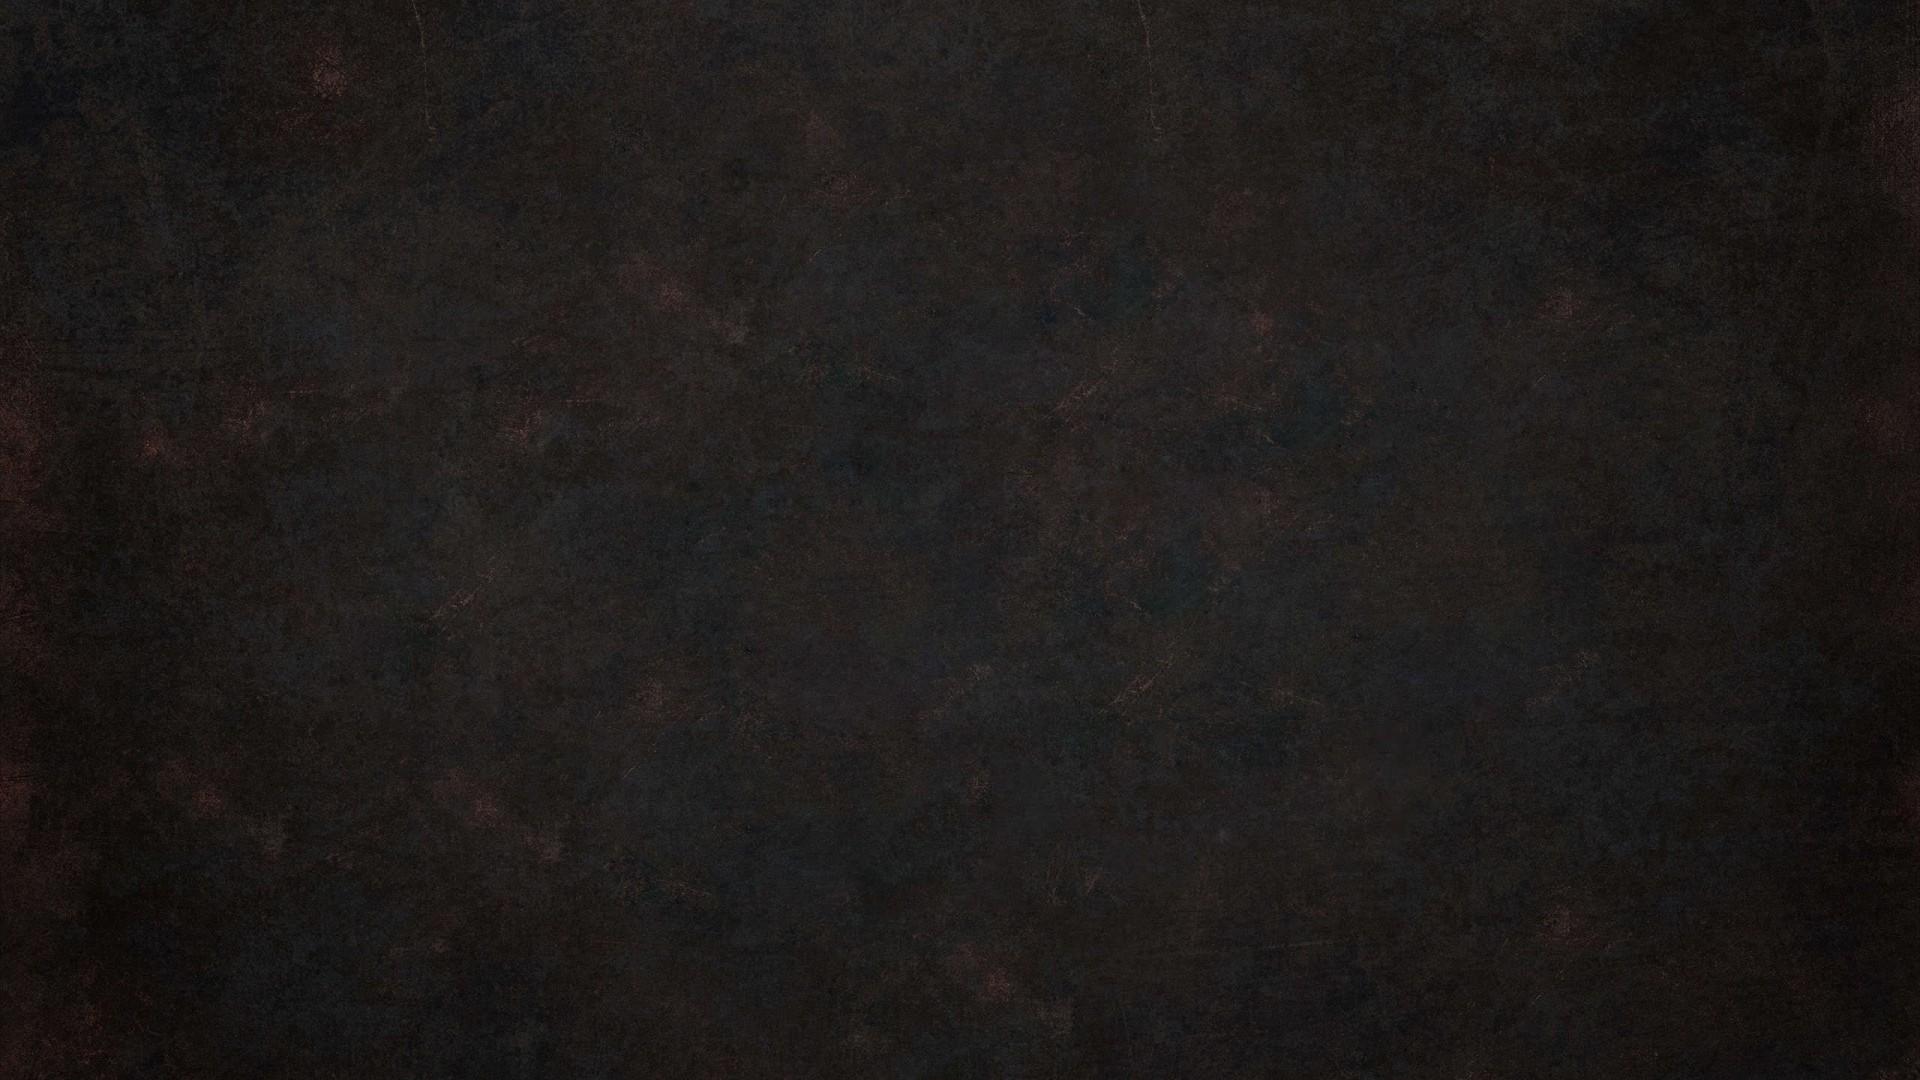 Wonderful Wallpaper Macbook Grunge - 355038-free-download-black-grunge-background-1920x1080-macbook  Trends_184012.jpg